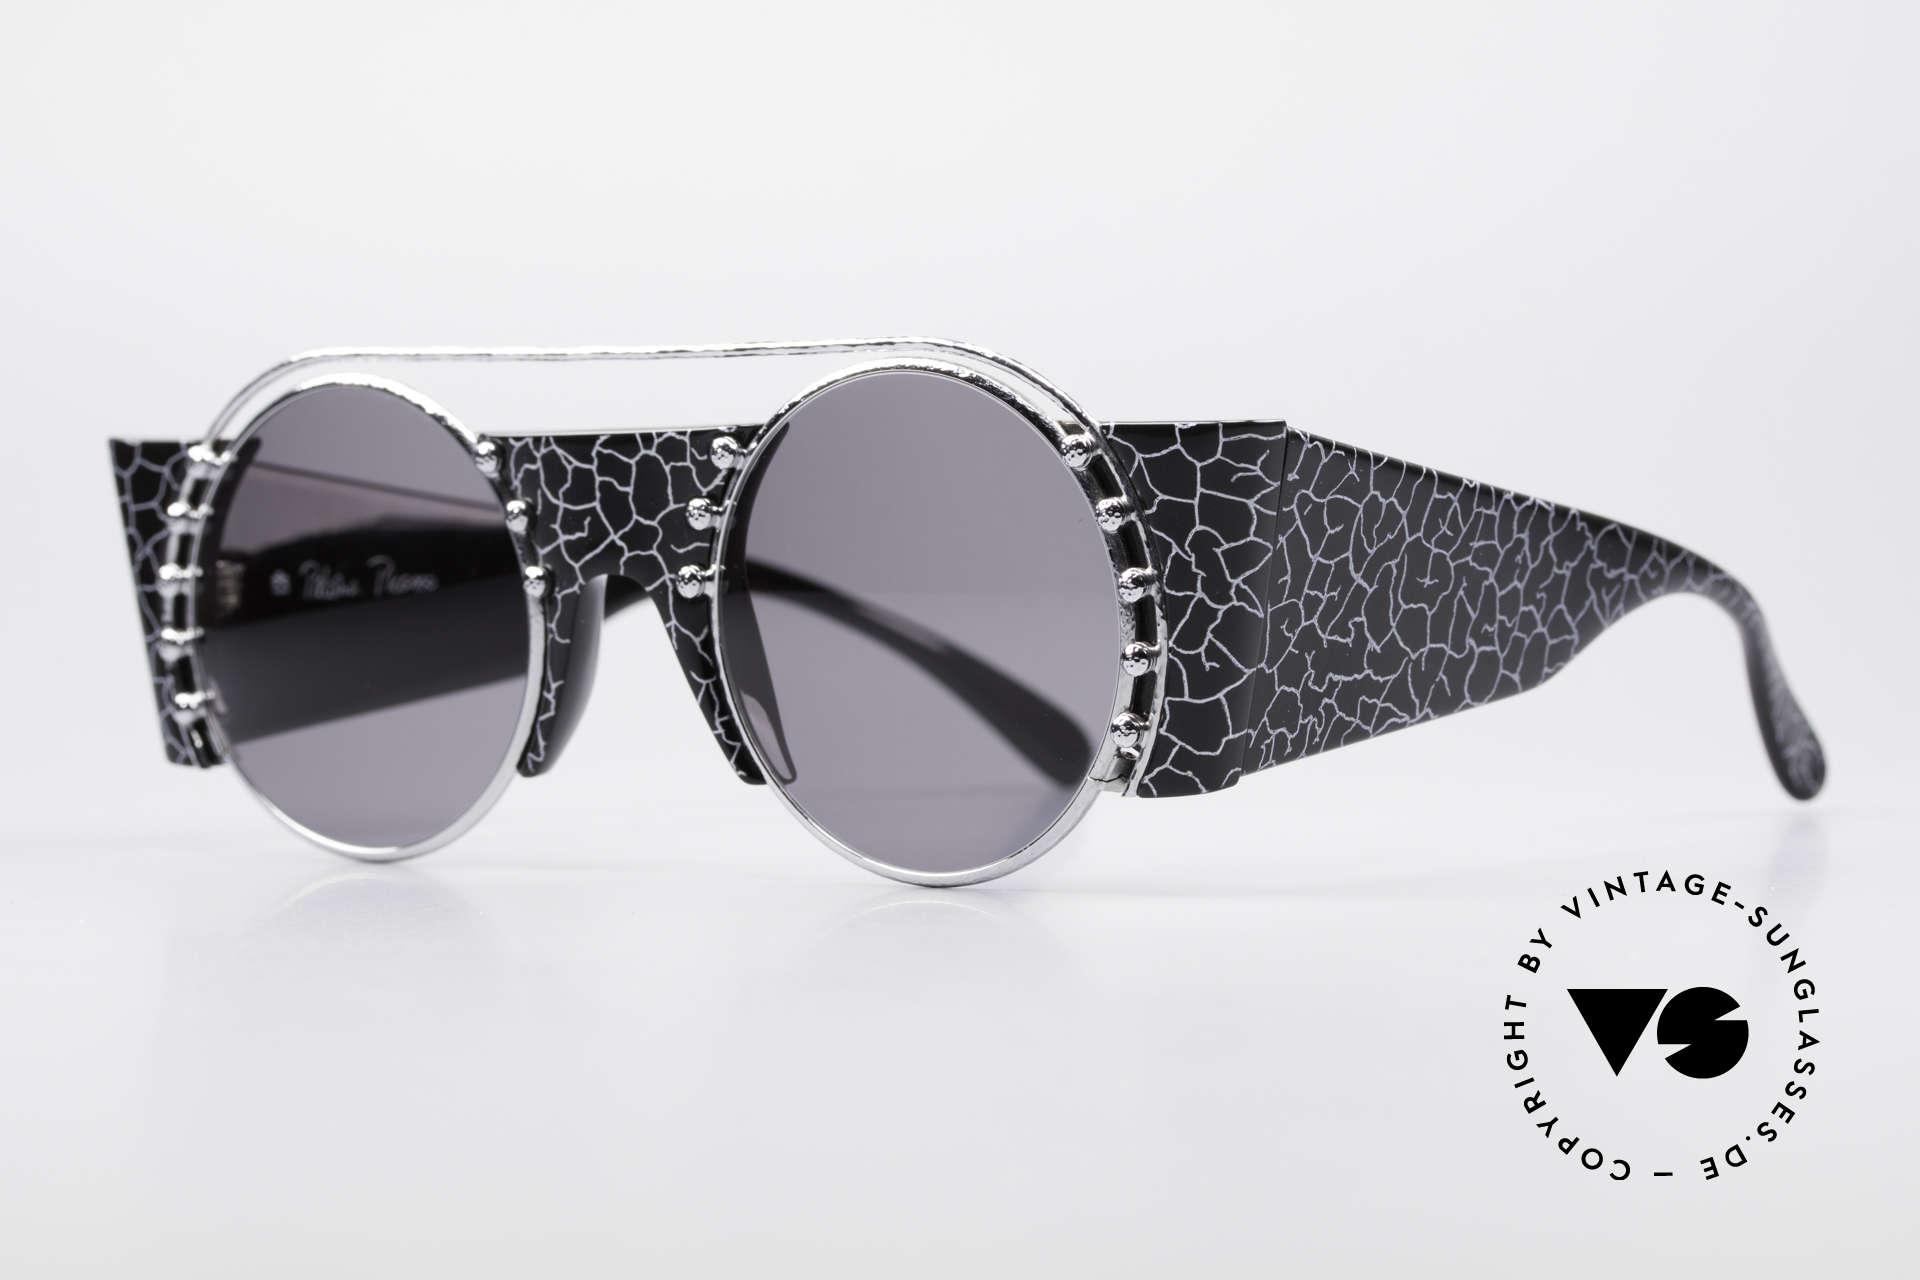 f22aed7225ead Sunglasses Paloma Picasso 3729 Lady Gaga Celebrity Shades